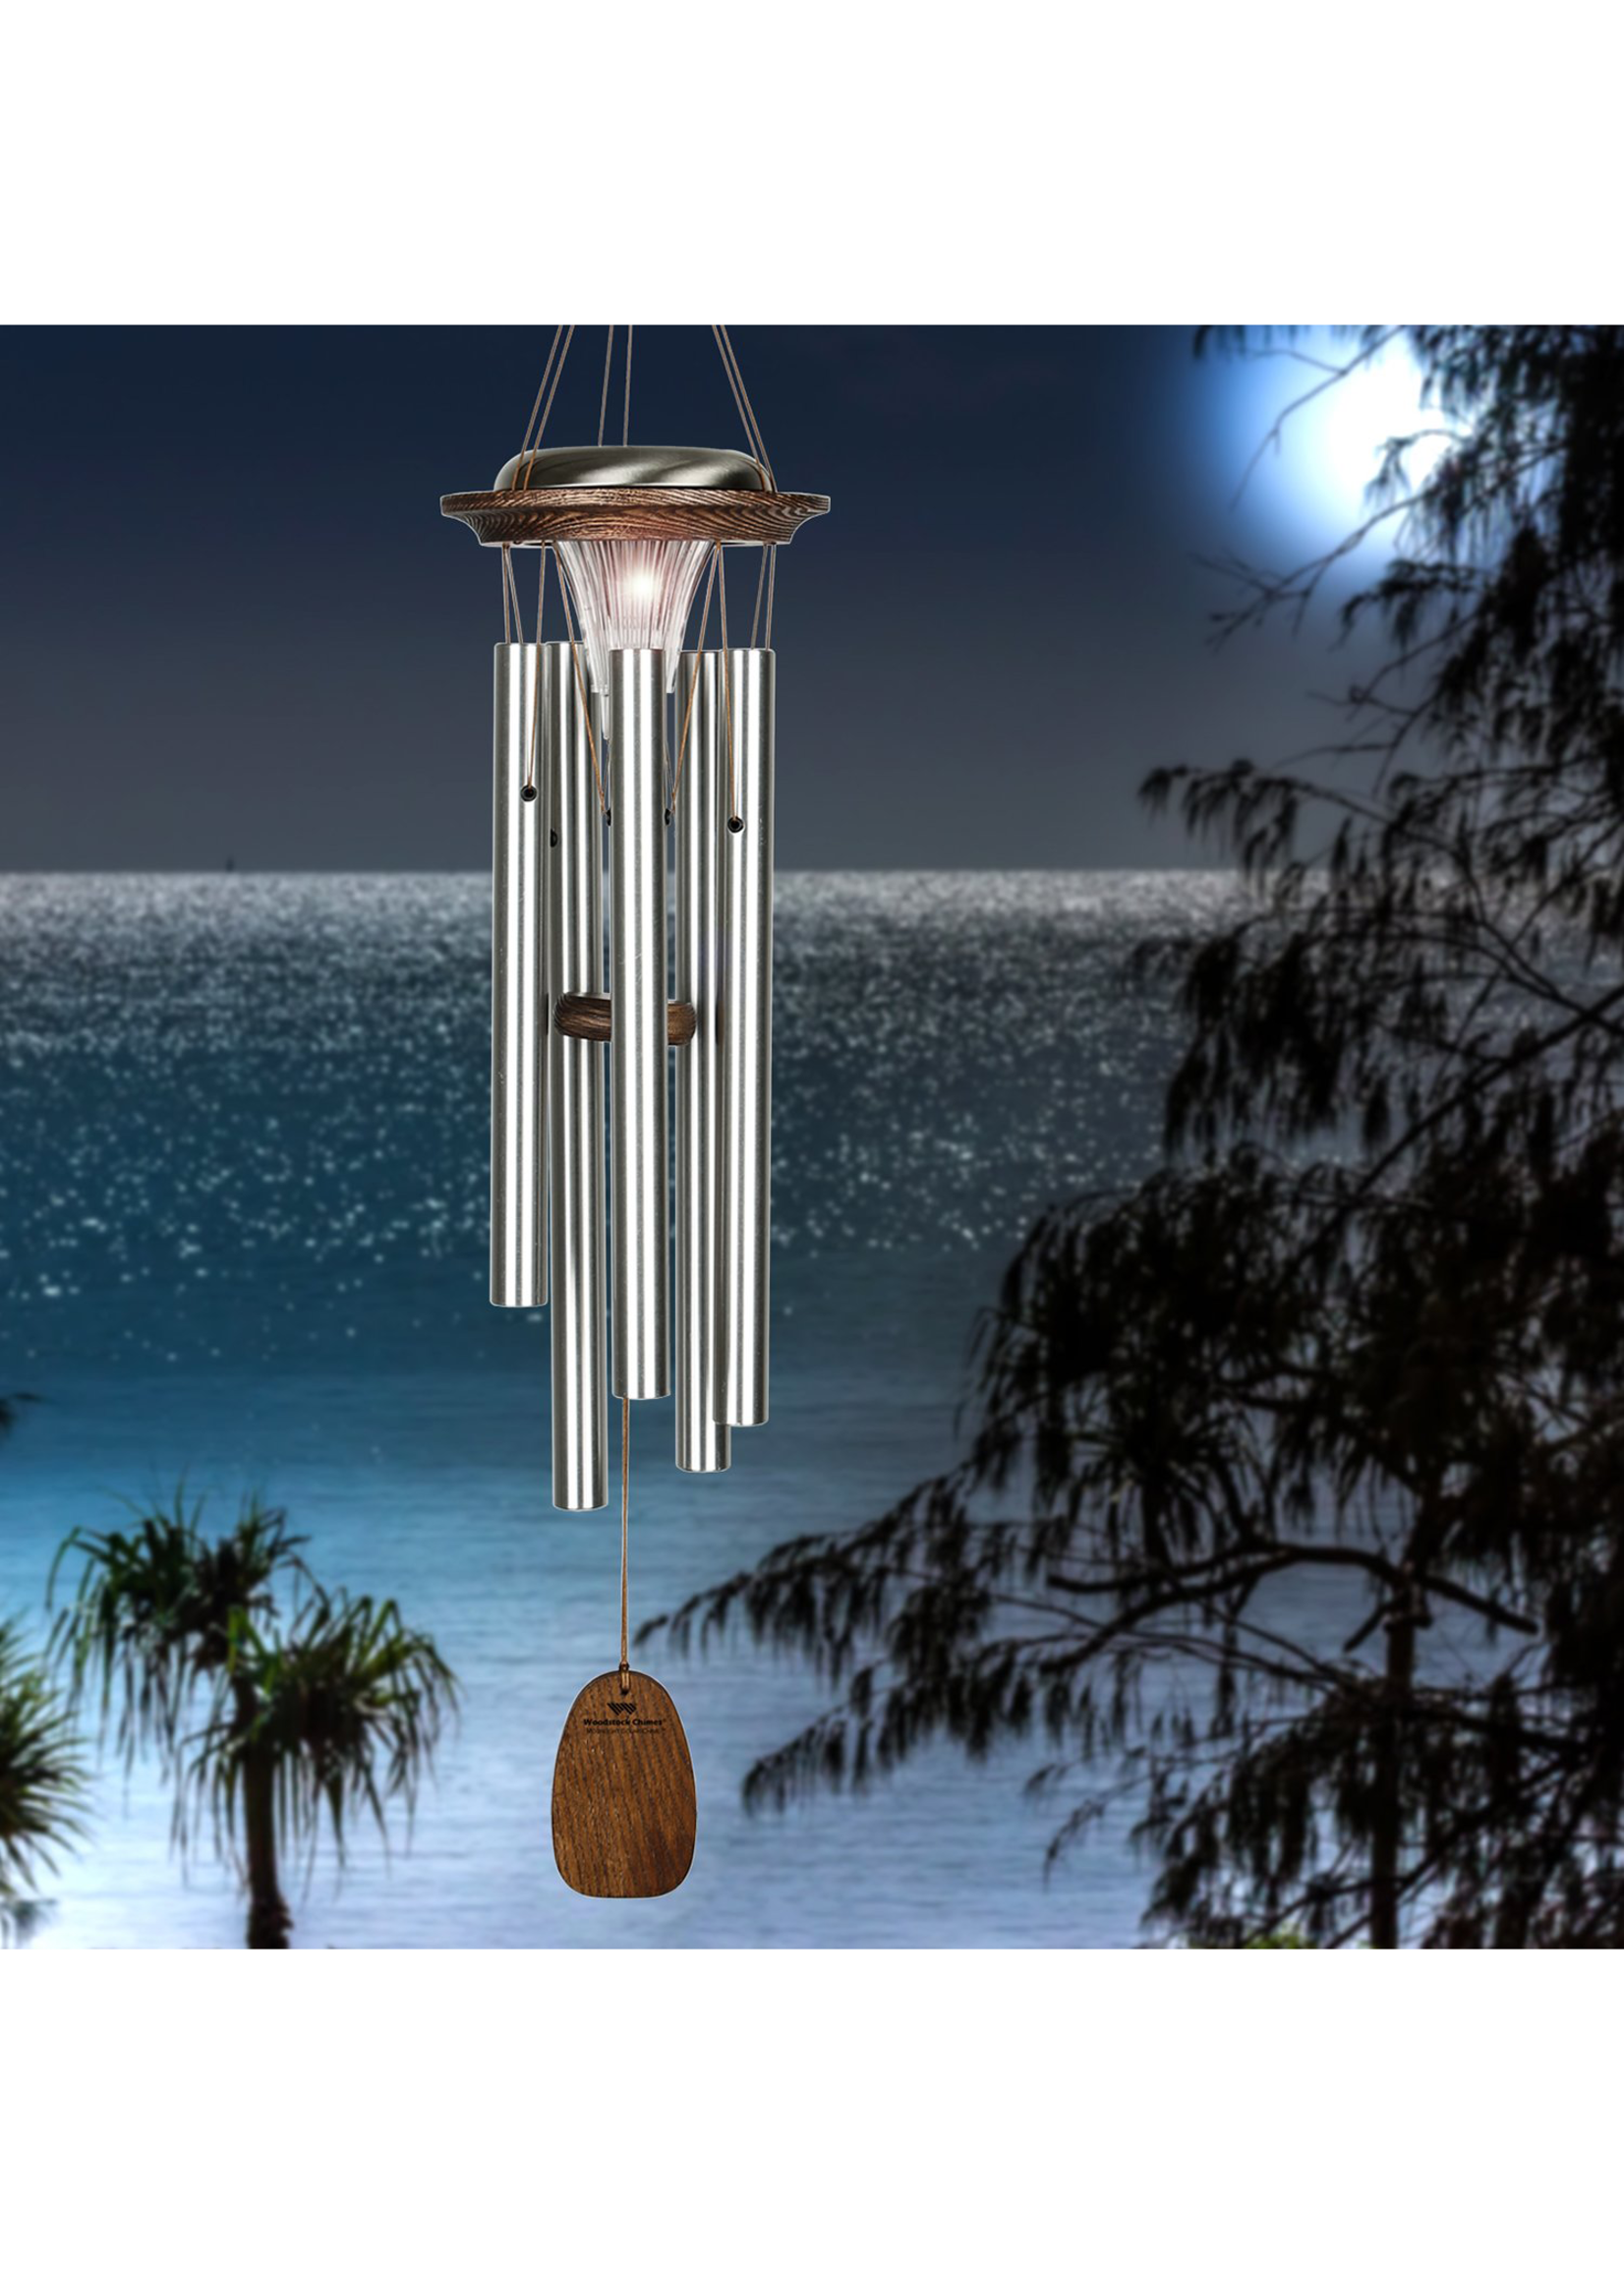 Woodstock Chimes Moonlight Solar Chime - Silver